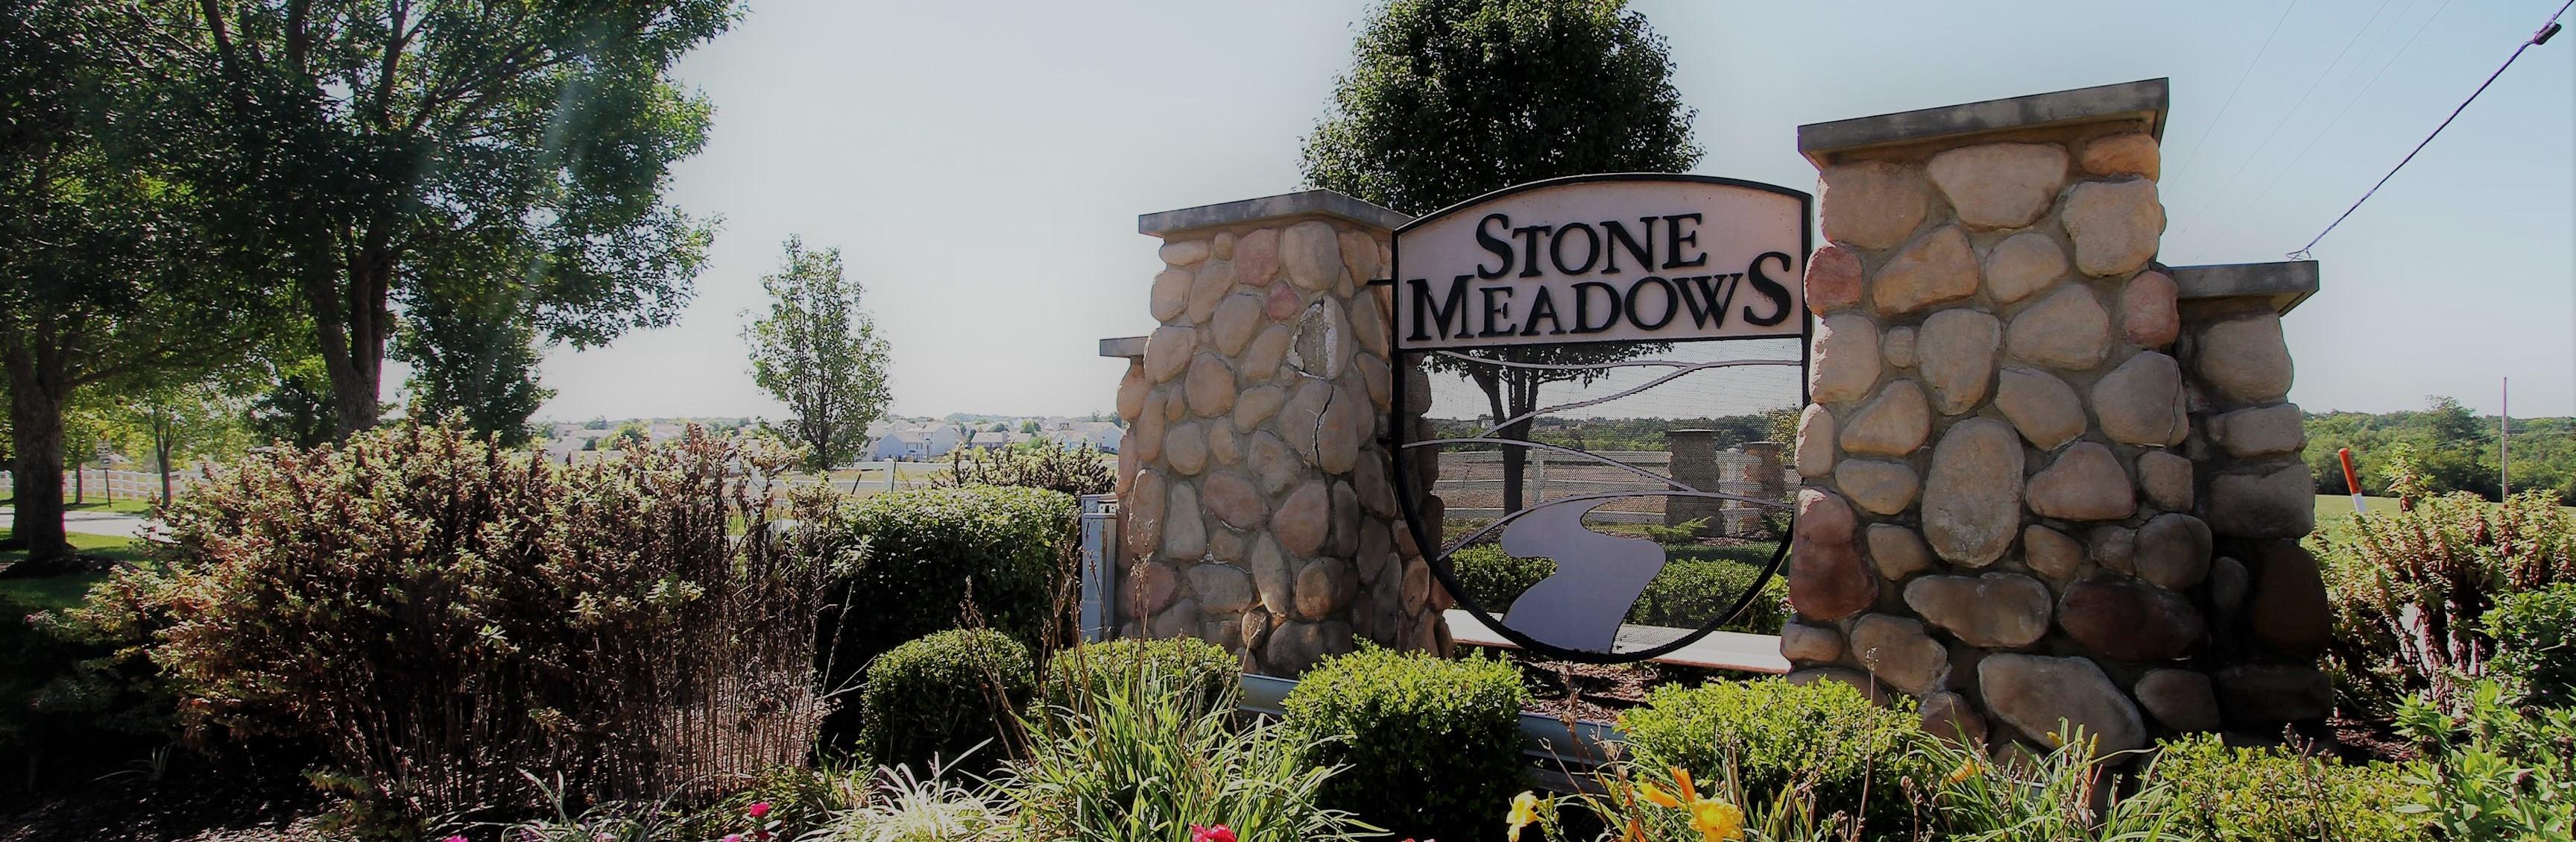 Stone Meadows, Wentzville, MO